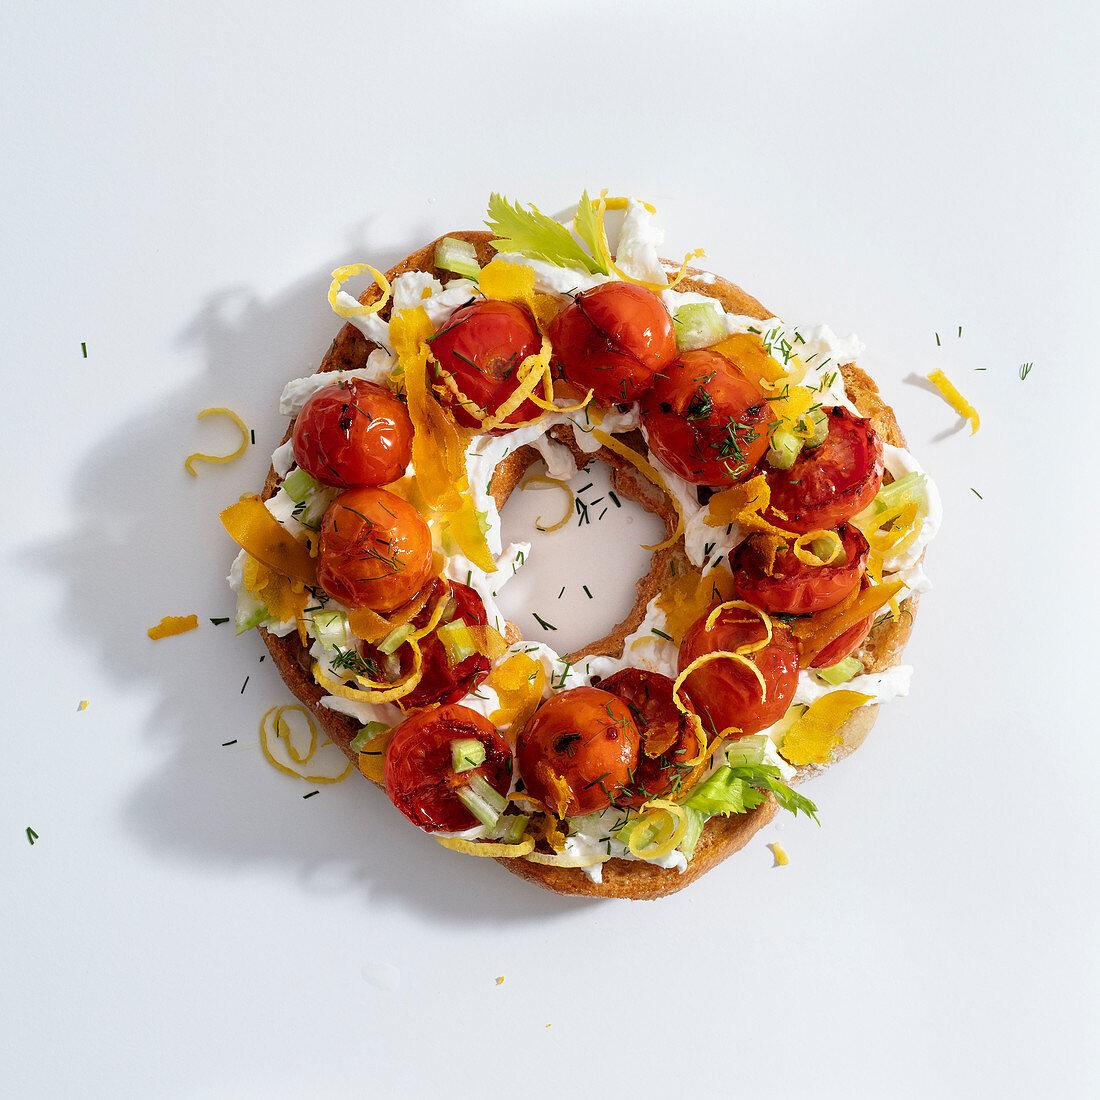 Frisella farcita (topped bread ring, Italy)